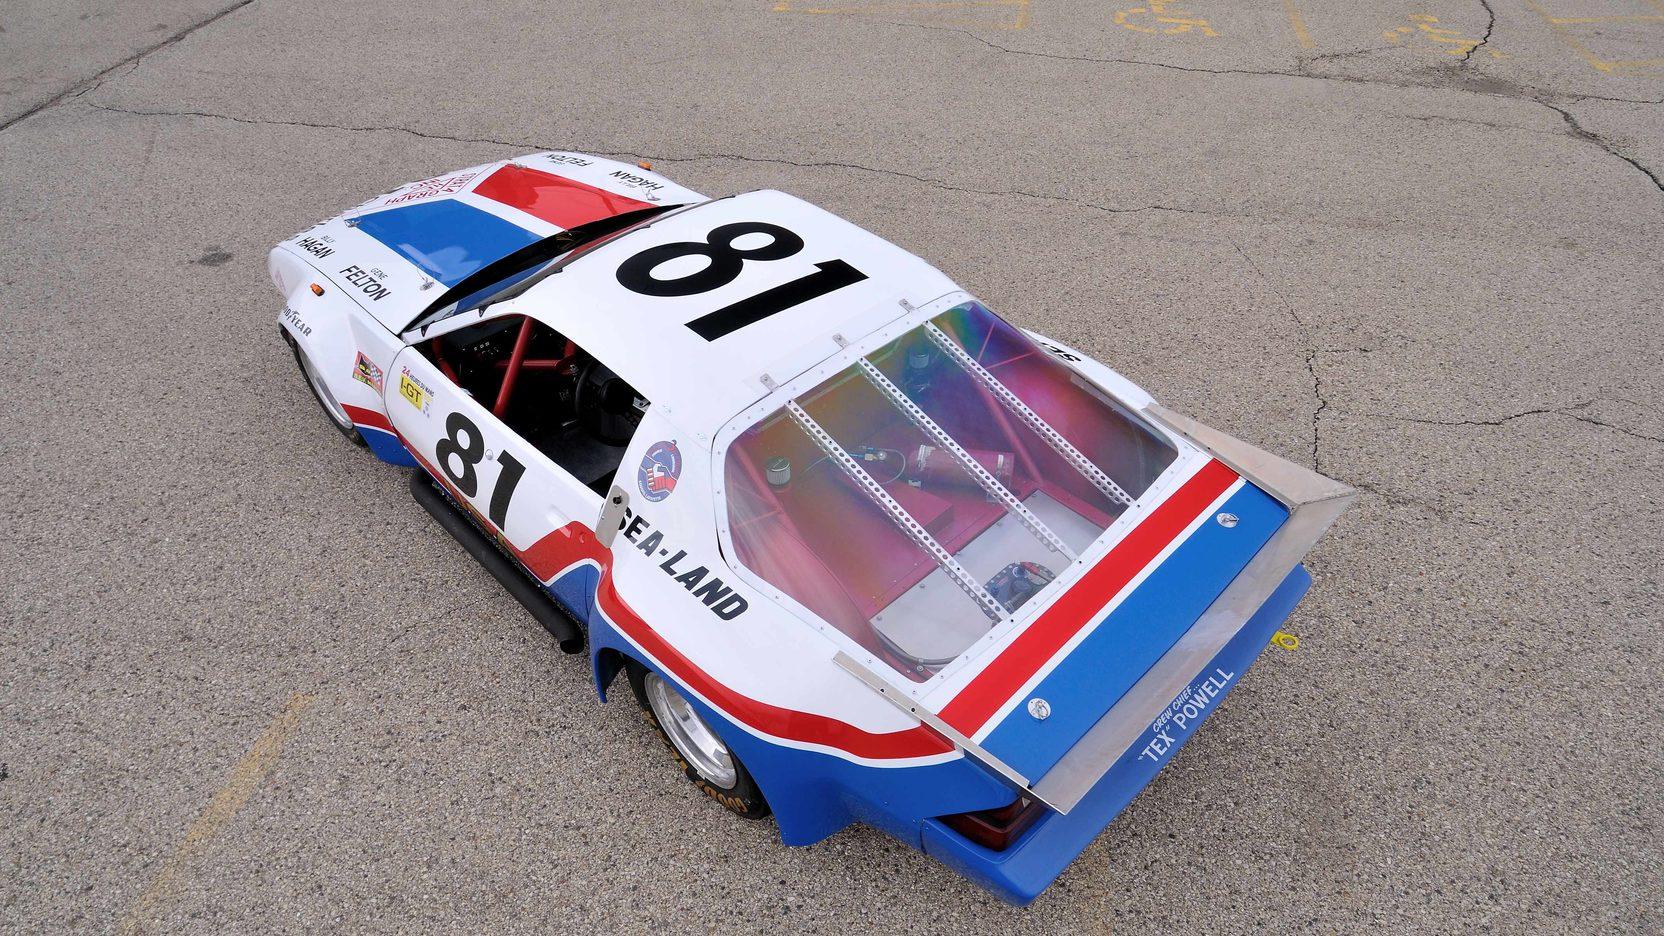 1982 Chevrolet Camaro Le Mans Race Car overhead rear